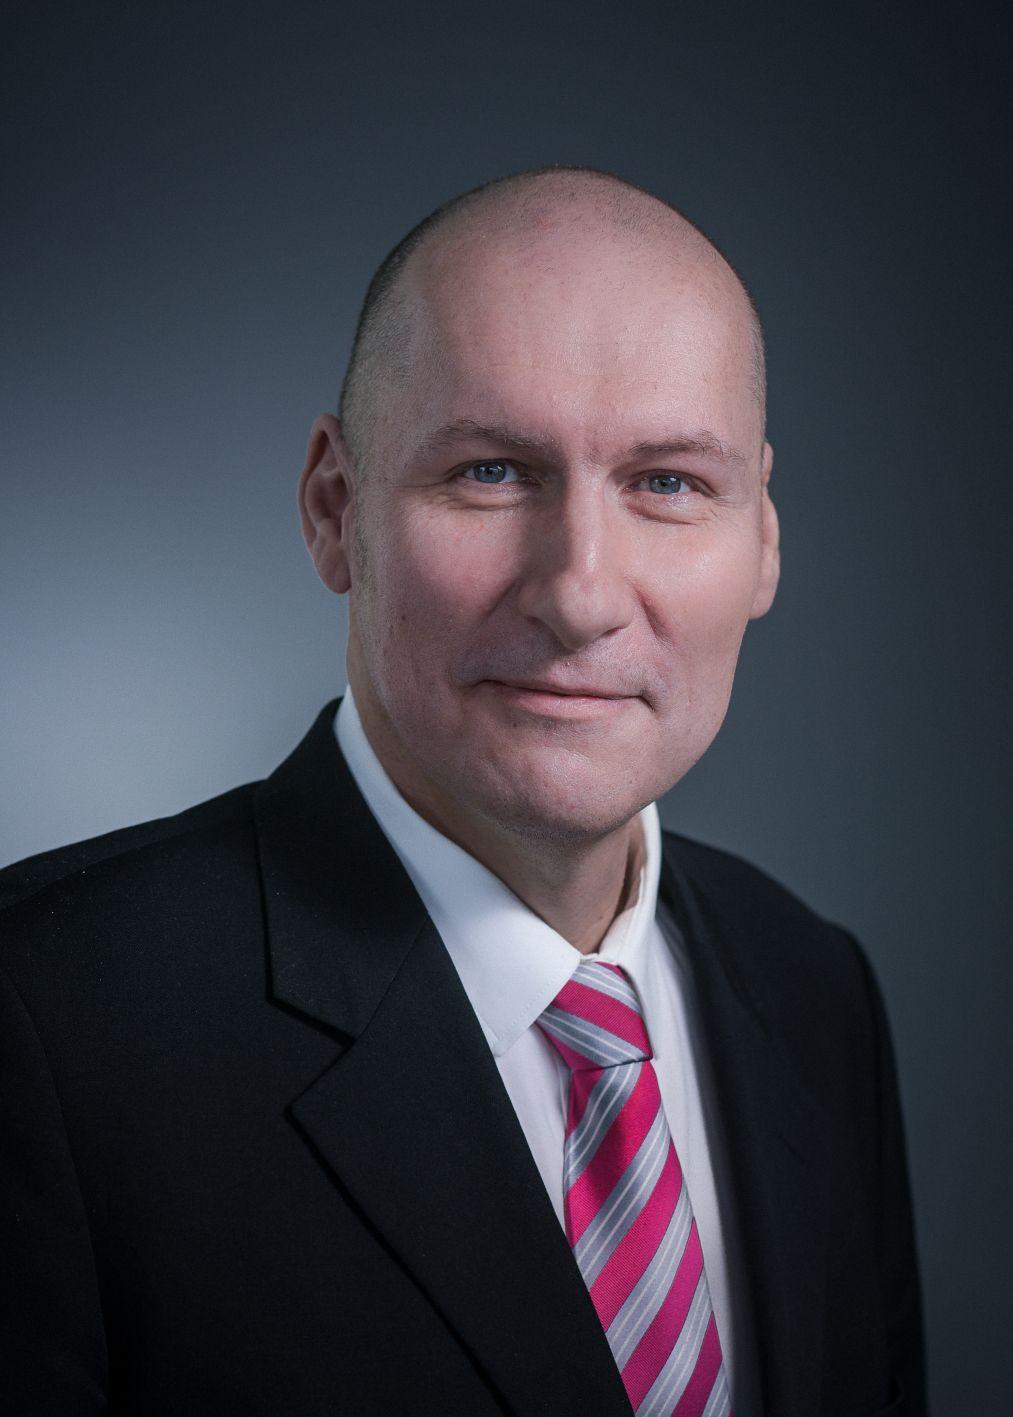 Ing. Peter Hoffmann, MBA, Produktmanager Mechanik, Klimatisierung & Automation Systems bei Rittal